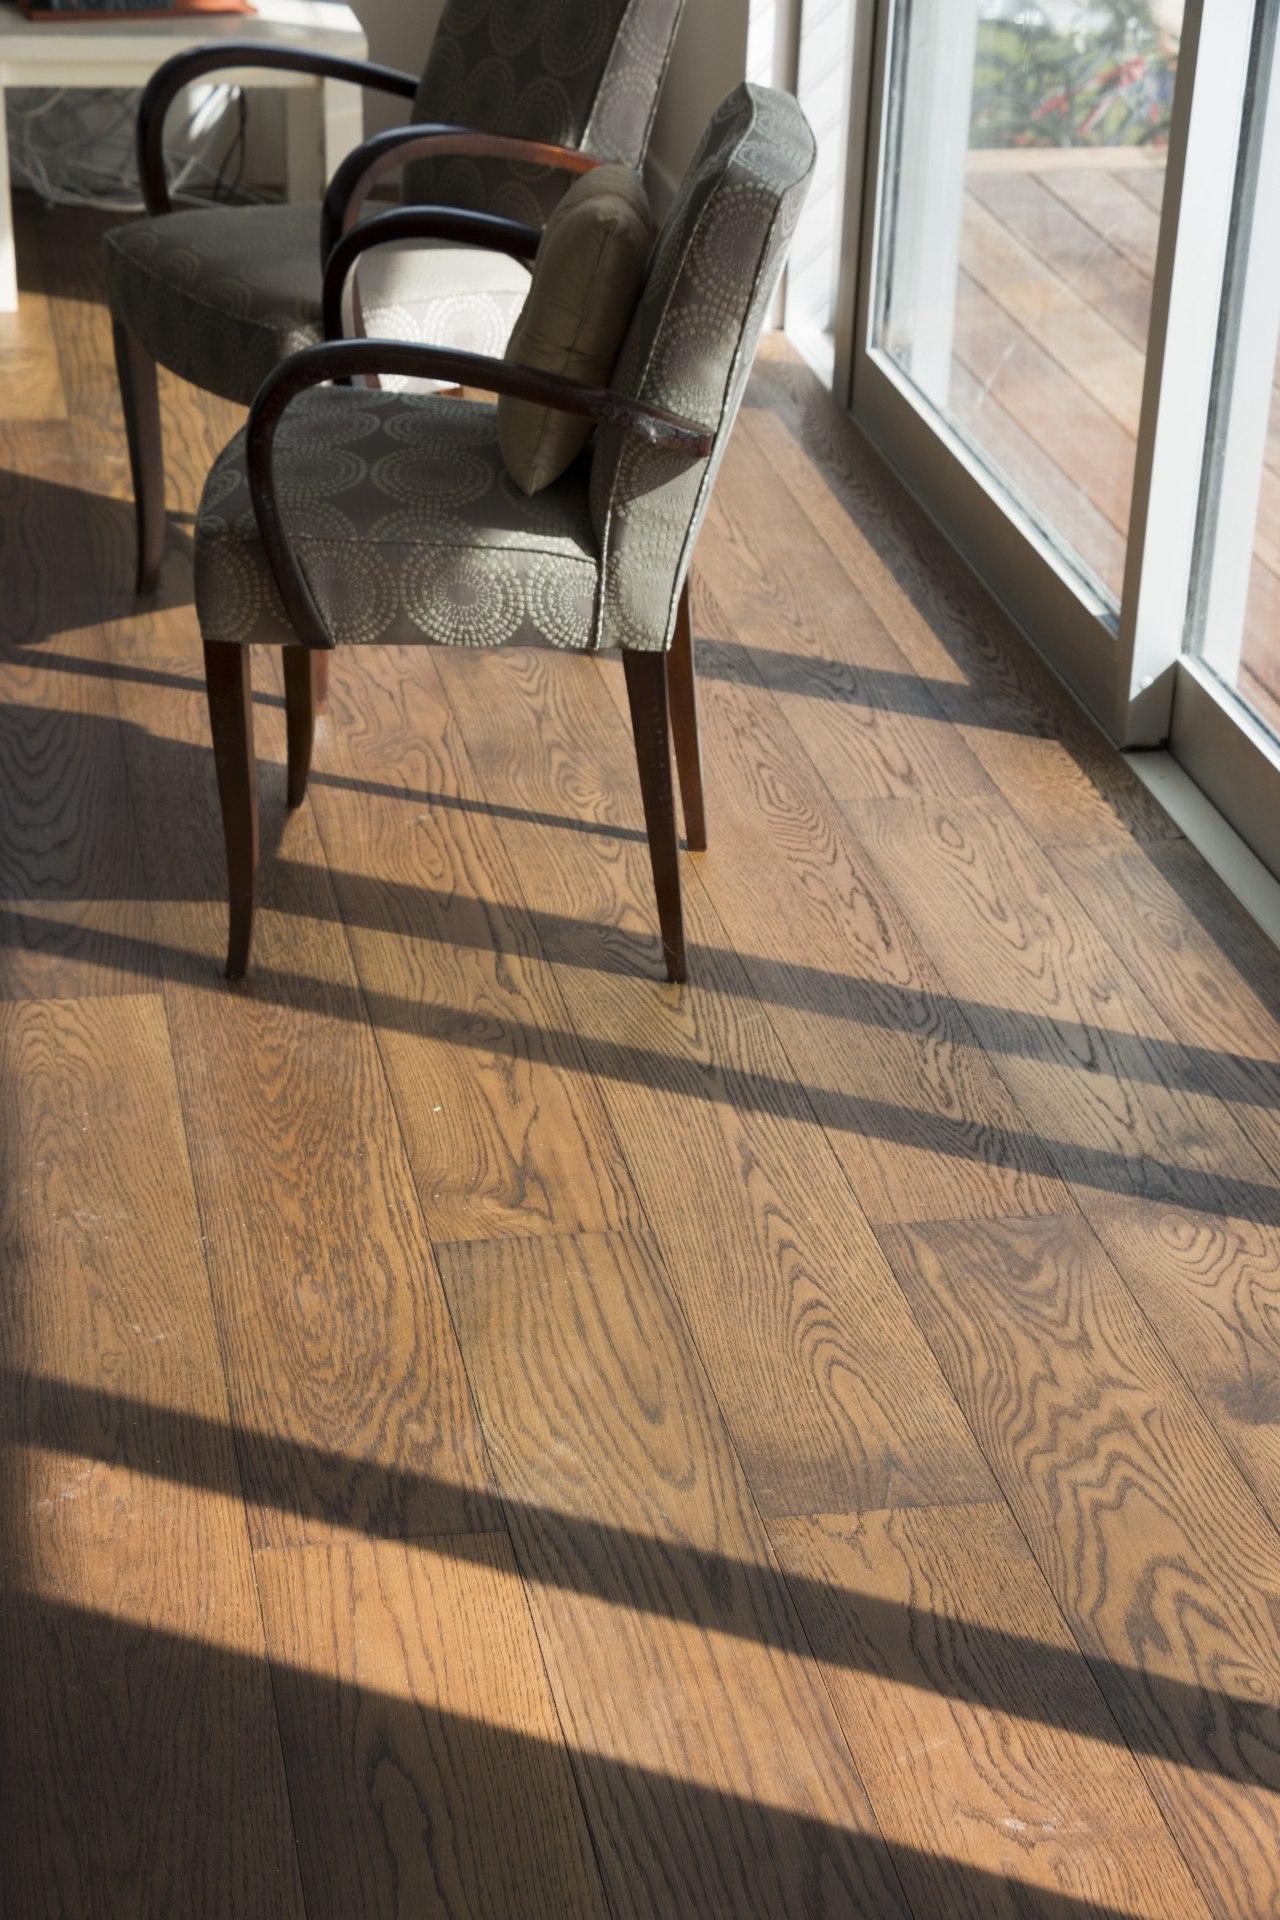 creative flooring prefinished hardwax oiled wood floors are chair, floor, flooring, furniture, hardwood, laminate flooring, tile, wood, wood flooring, wood stain, orange, black